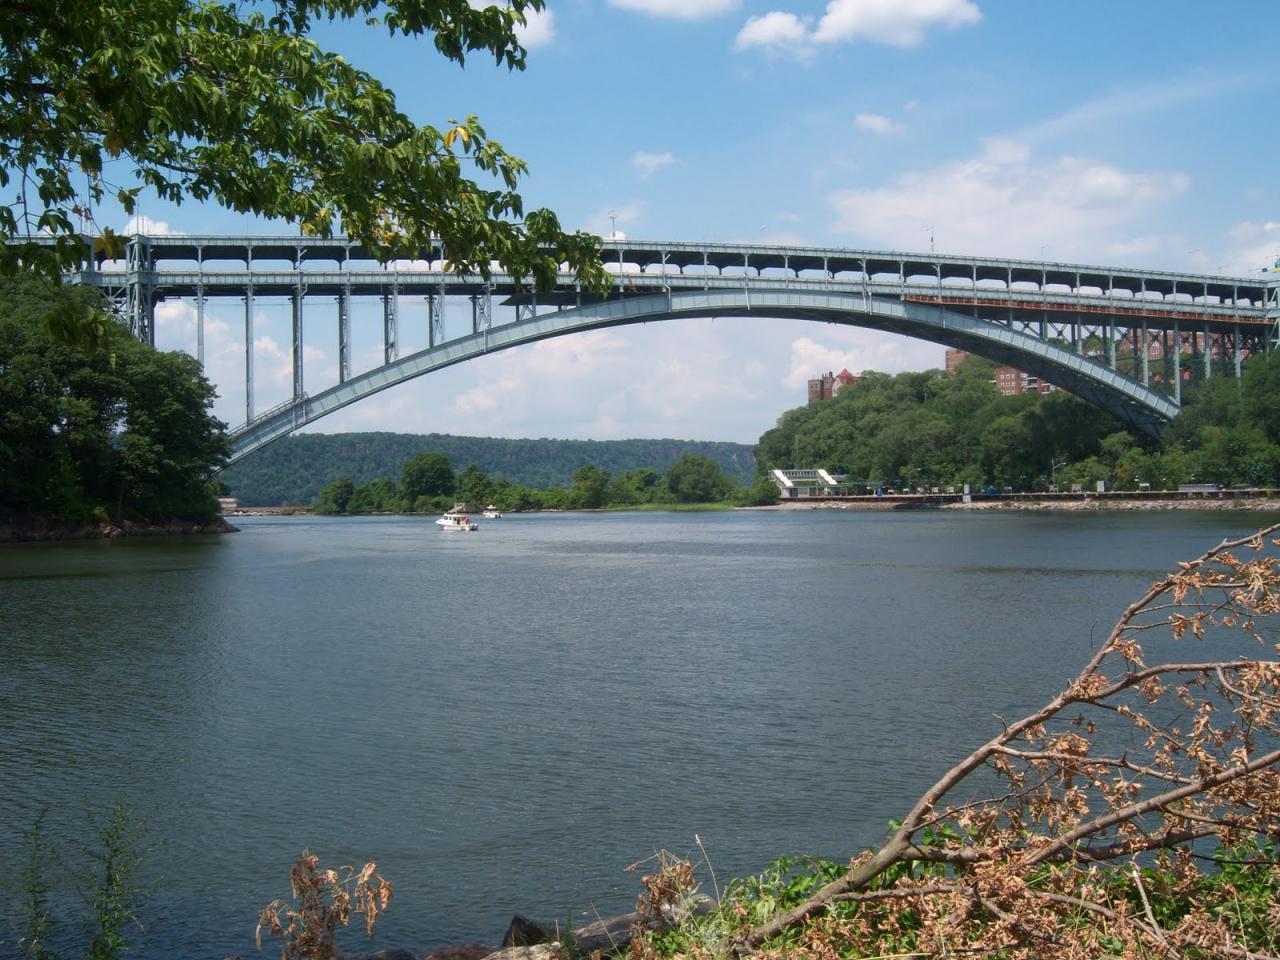 The real Henry Hudson Bridge, in New York, NY